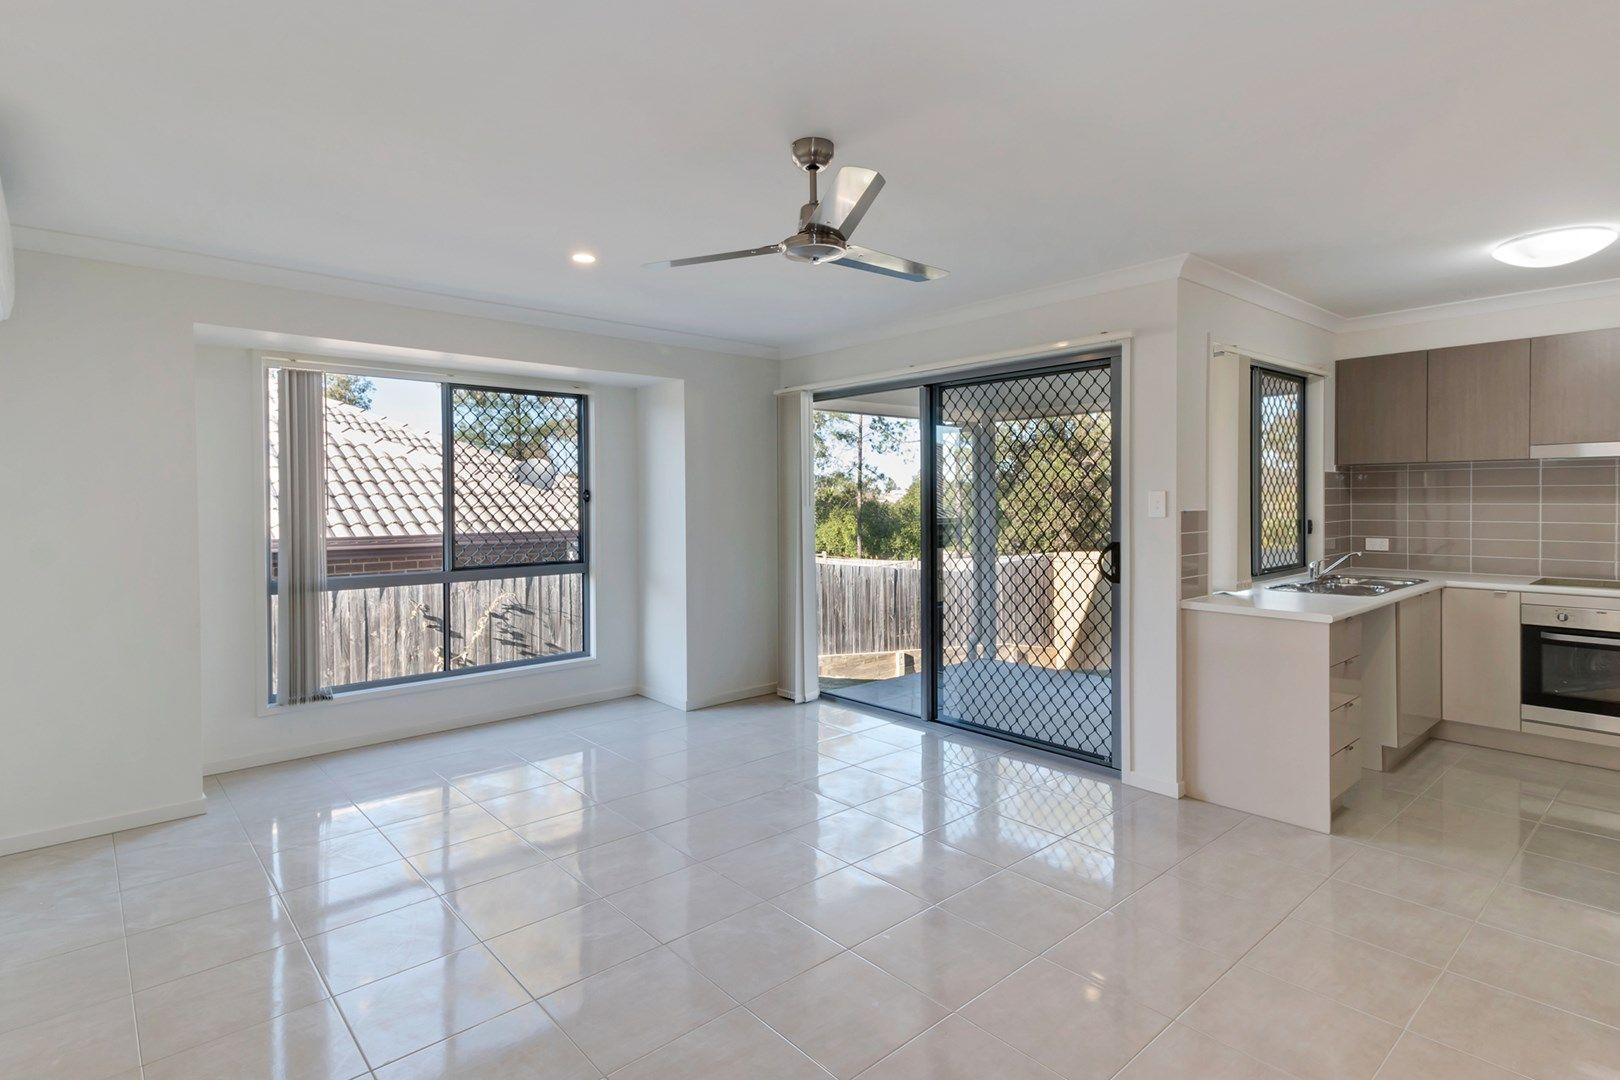 1/13 Ceres Street, Wulkuraka QLD 4305, Image 0